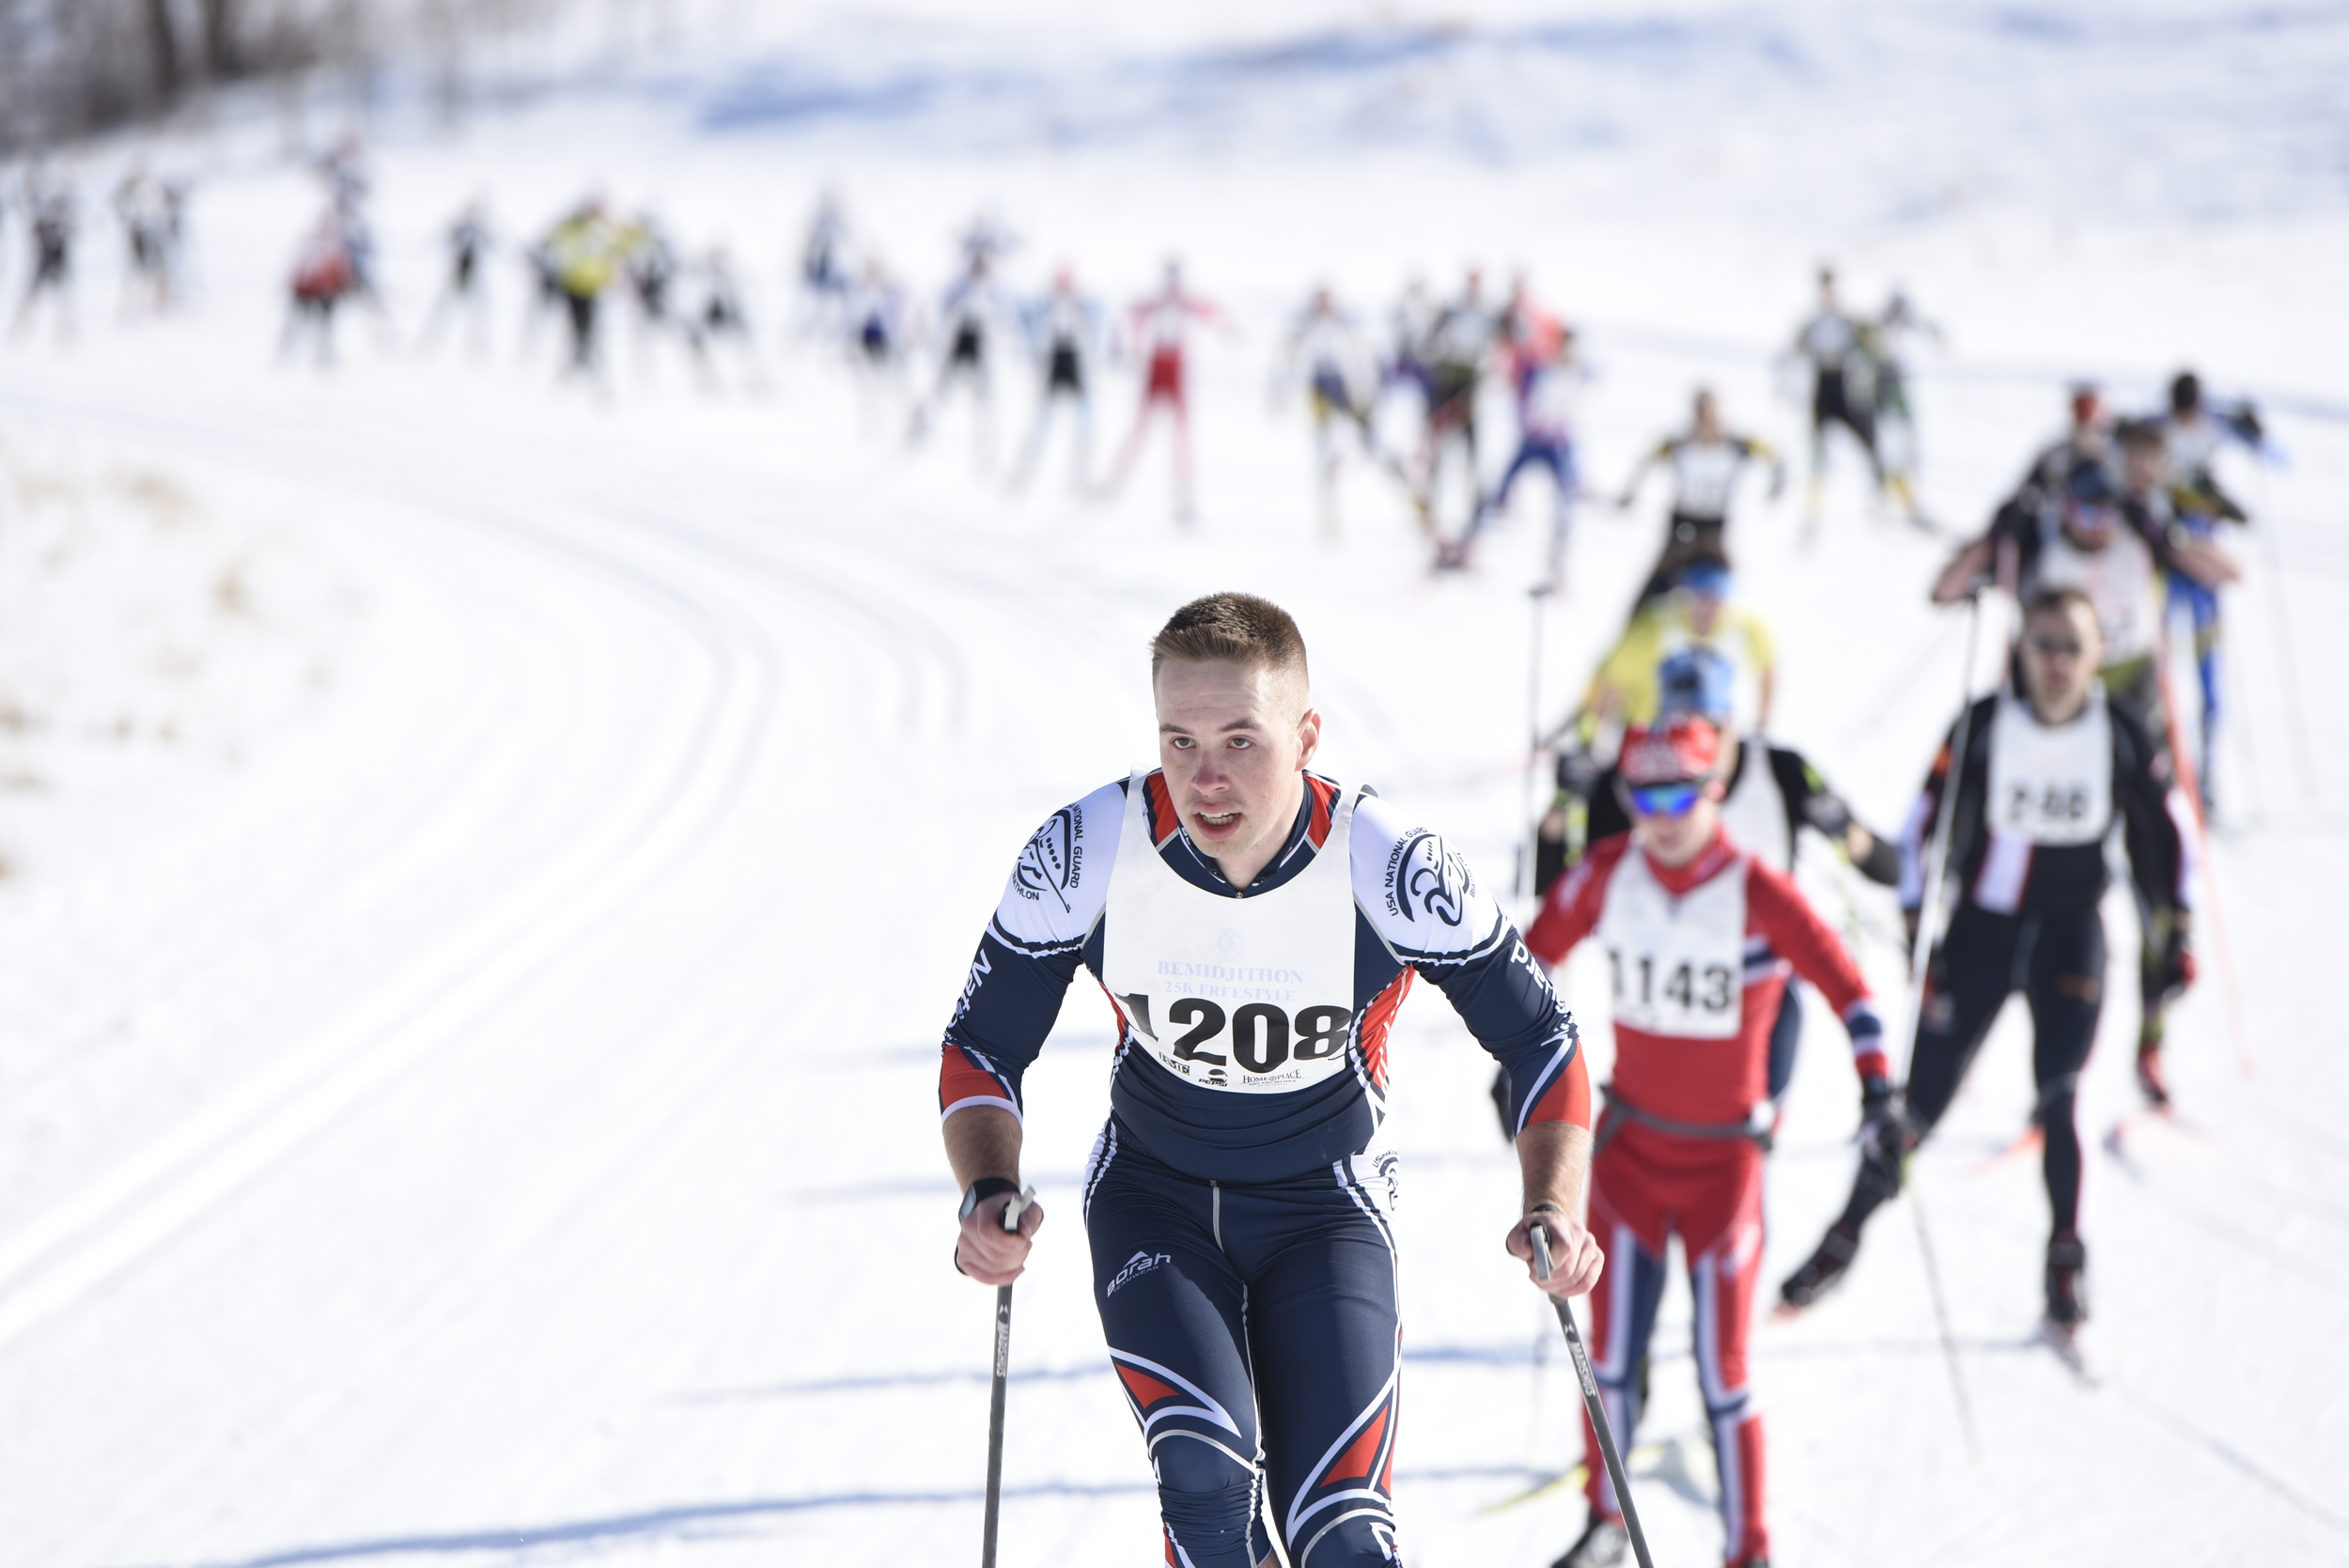 The start of the 34th annual Finlandia Ski Marathon at Buena Vista in Bemidji.